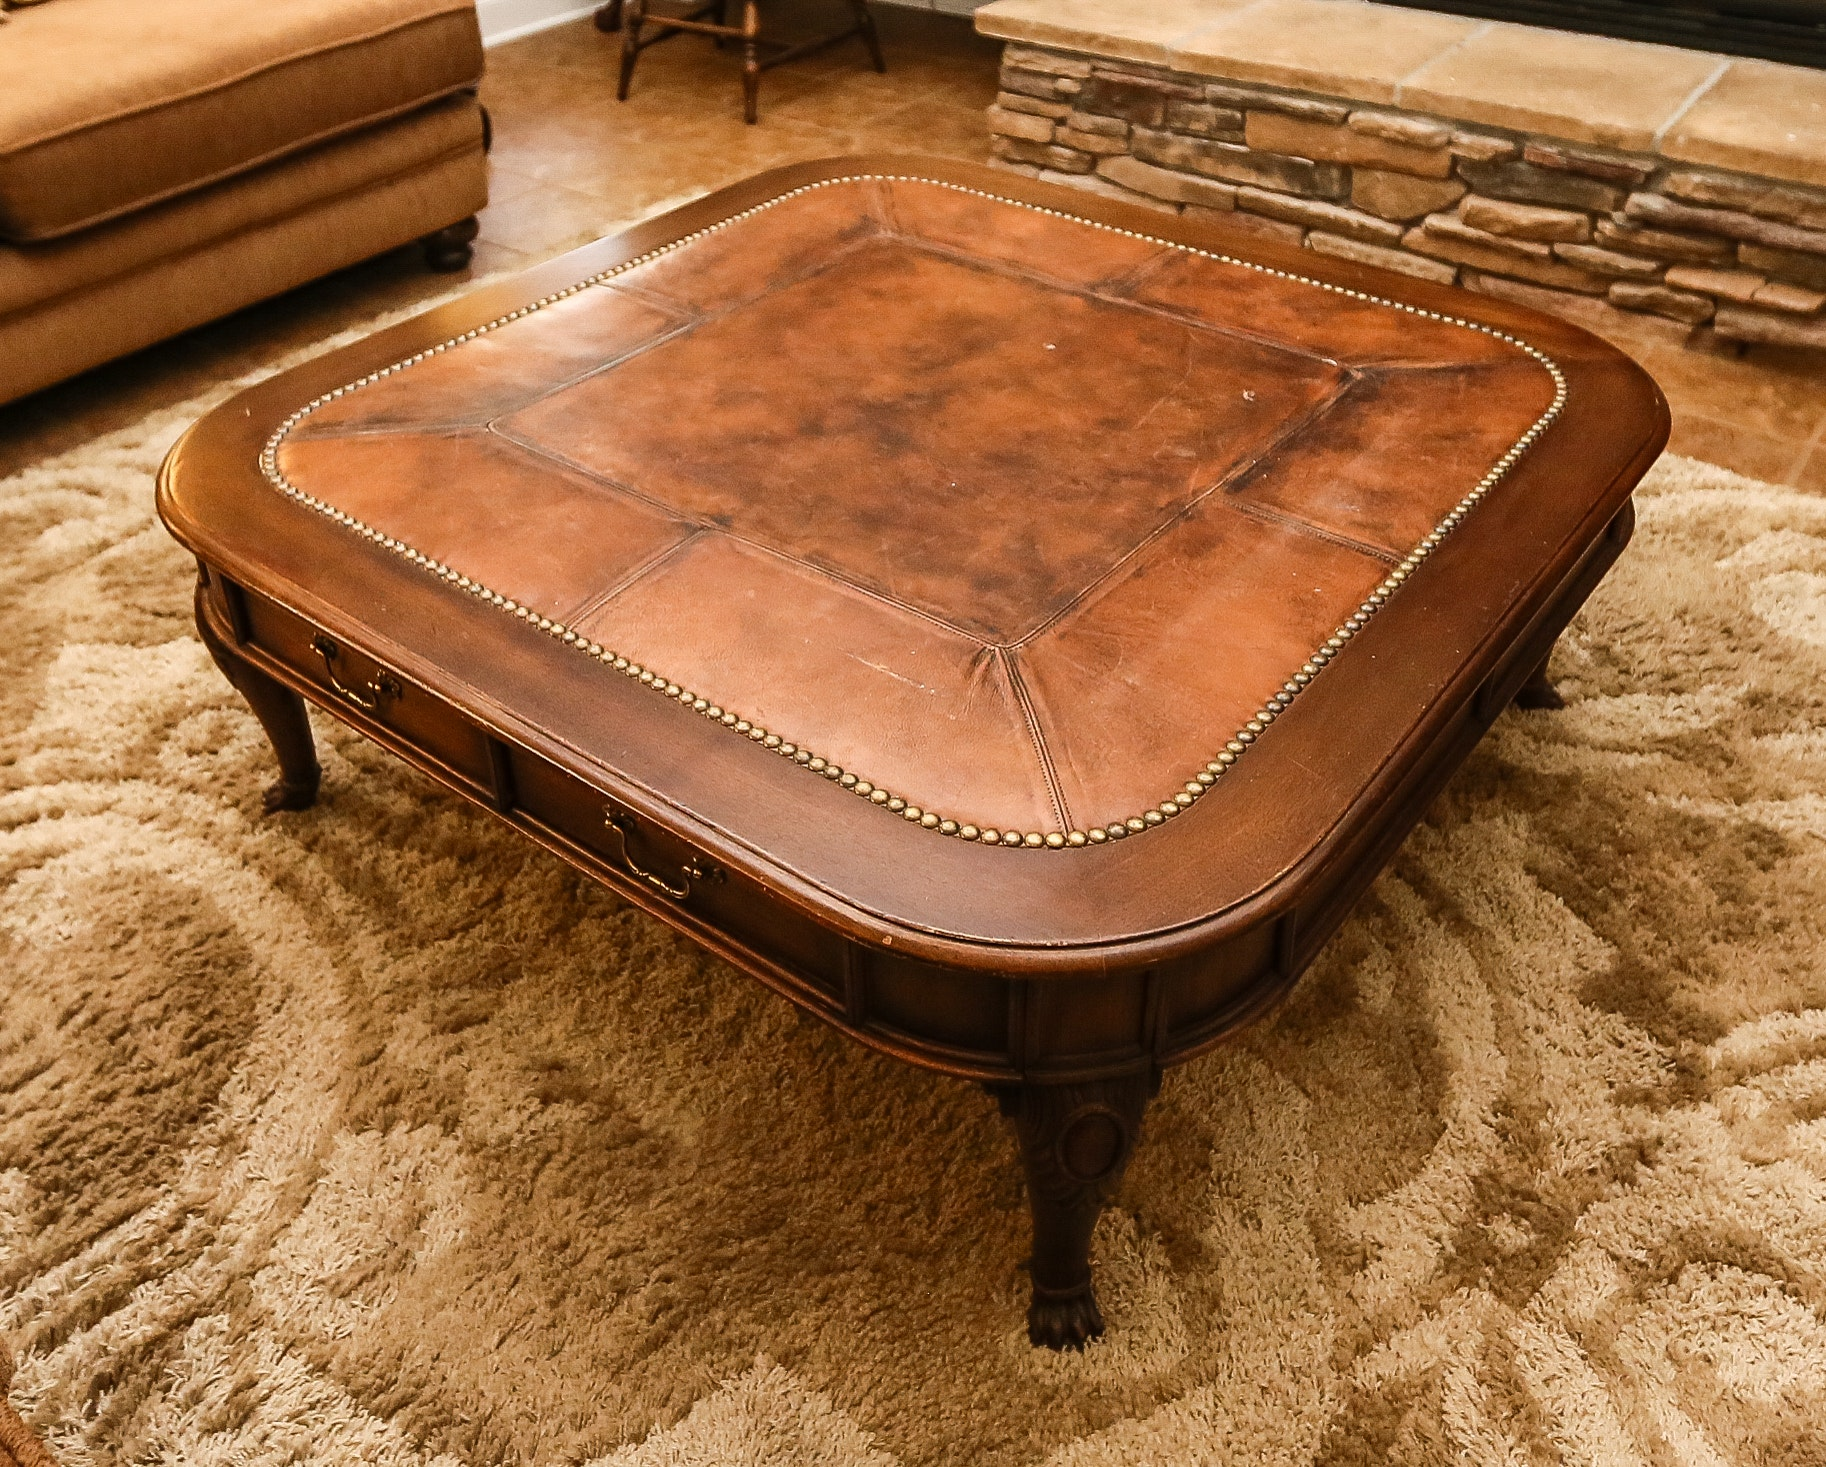 henredon leather top coffee table ebth